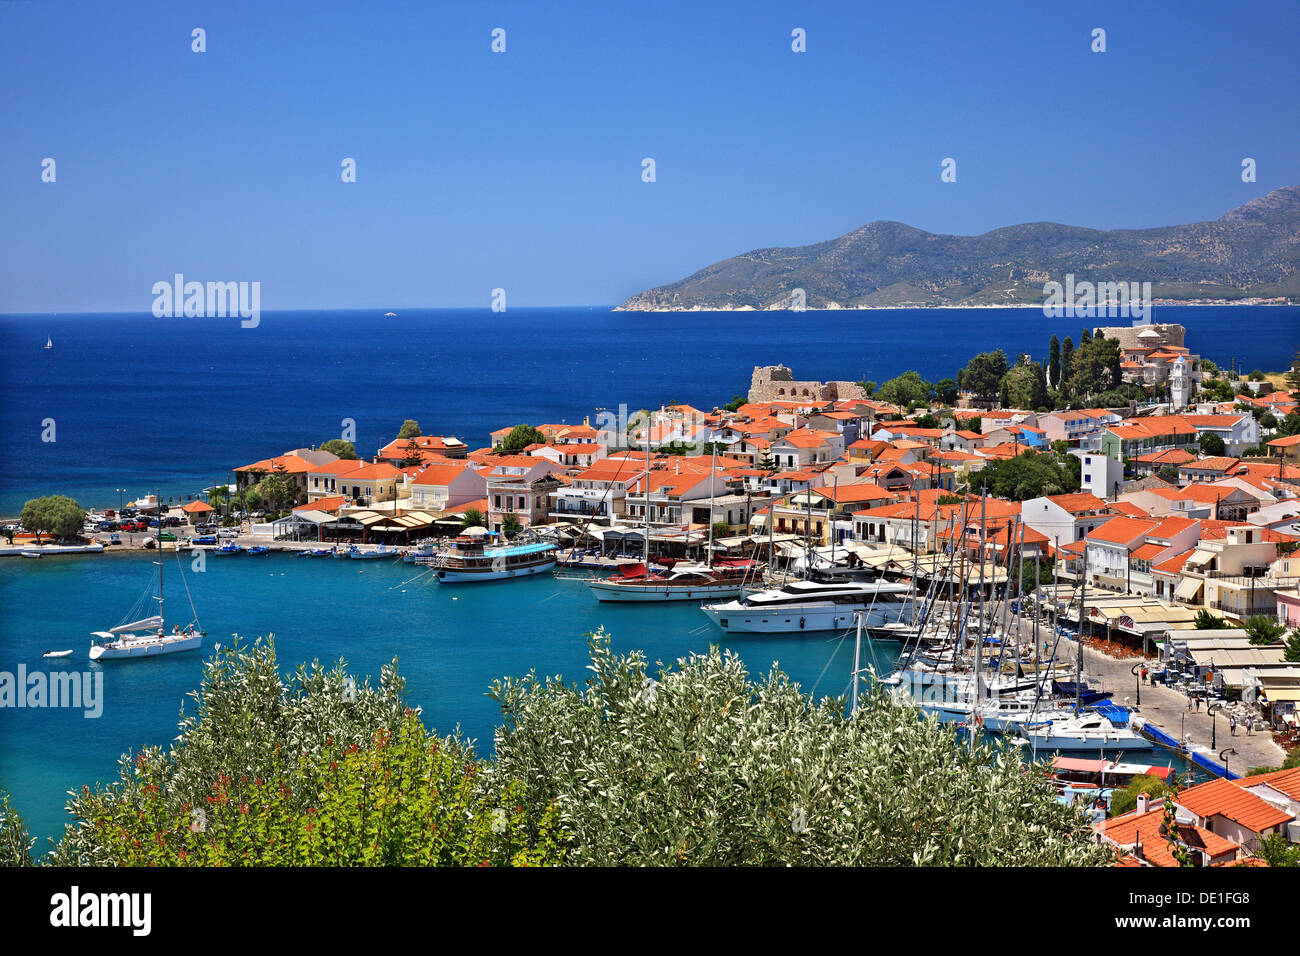 Pythagorio town, one of the most popular tourist destinations in Samos island, Aegean sea, Greece. Stock Photo